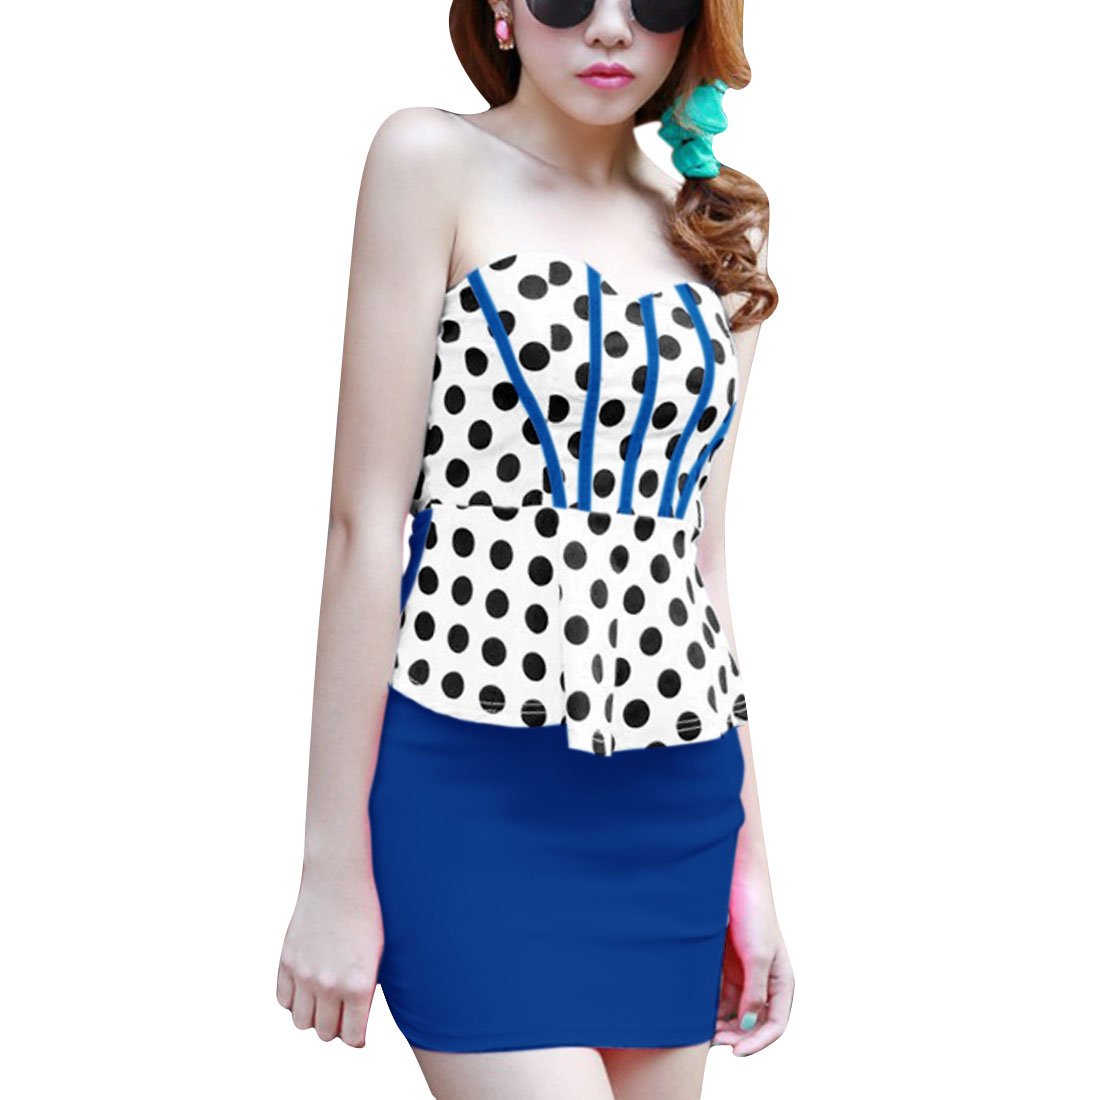 Women Off Shoulder Sleeveless Panel Elastic Dress Royal Blue White XS